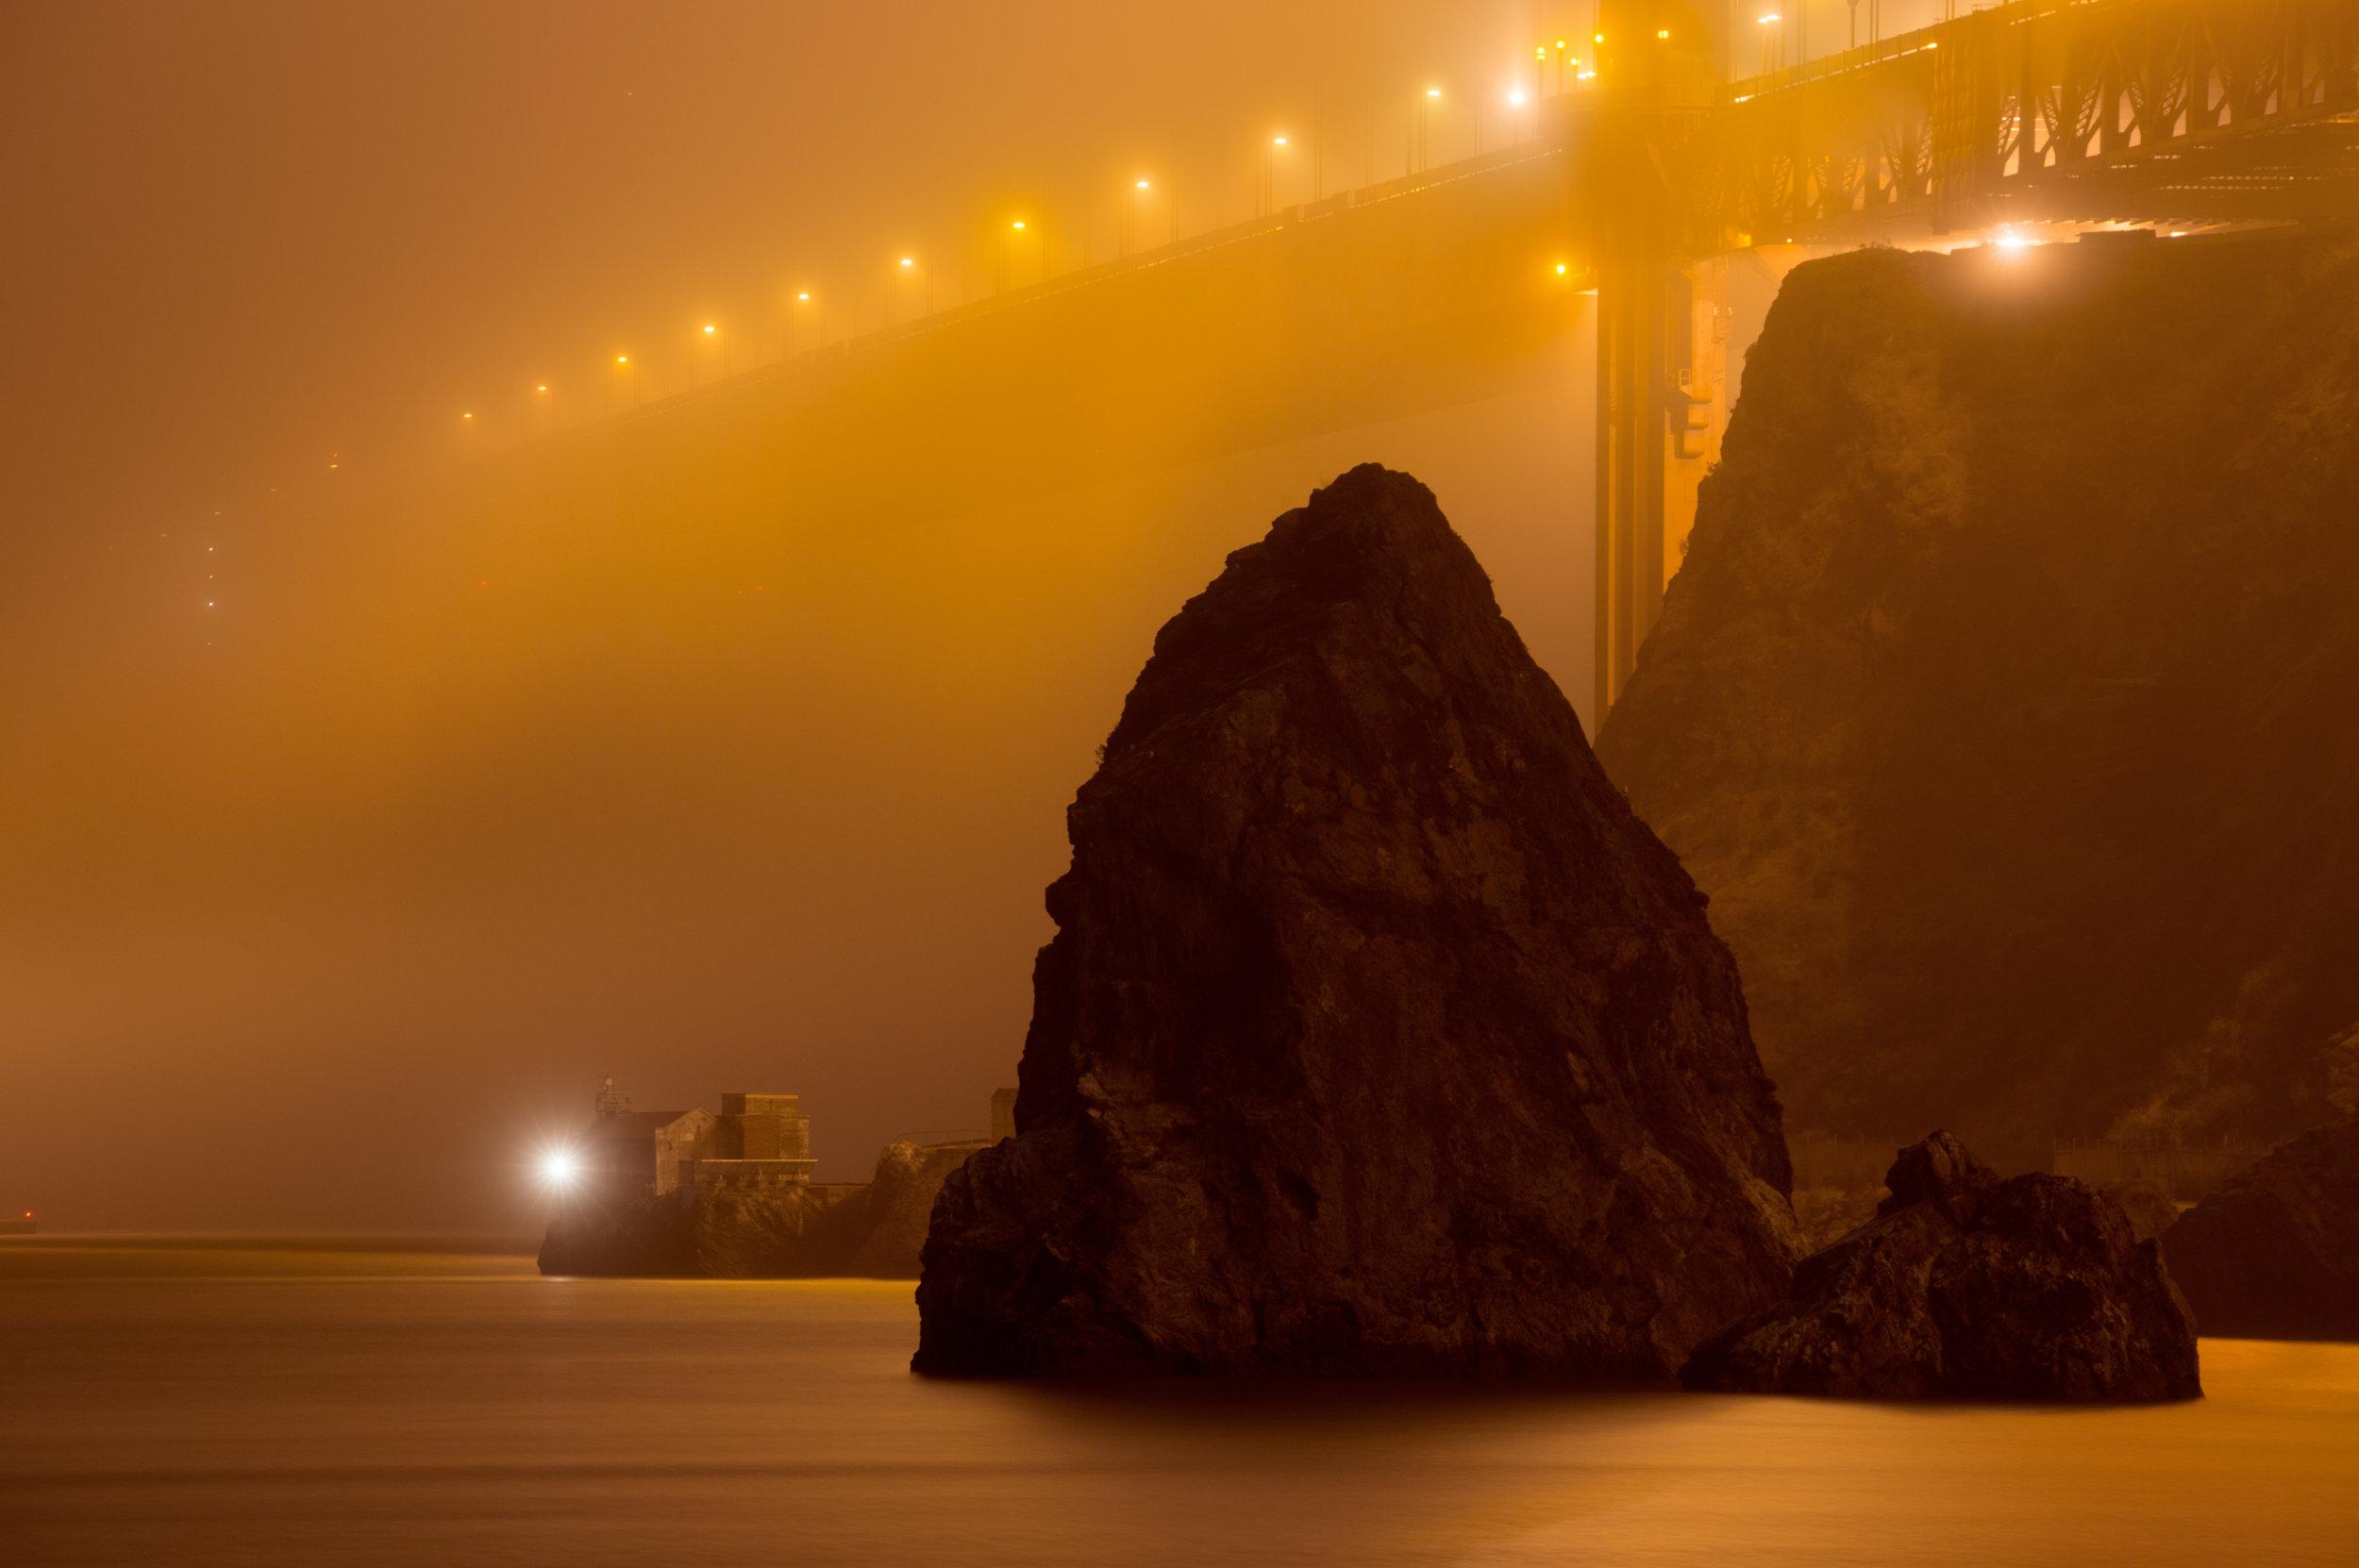 Lime Point Light House, Night, Fog